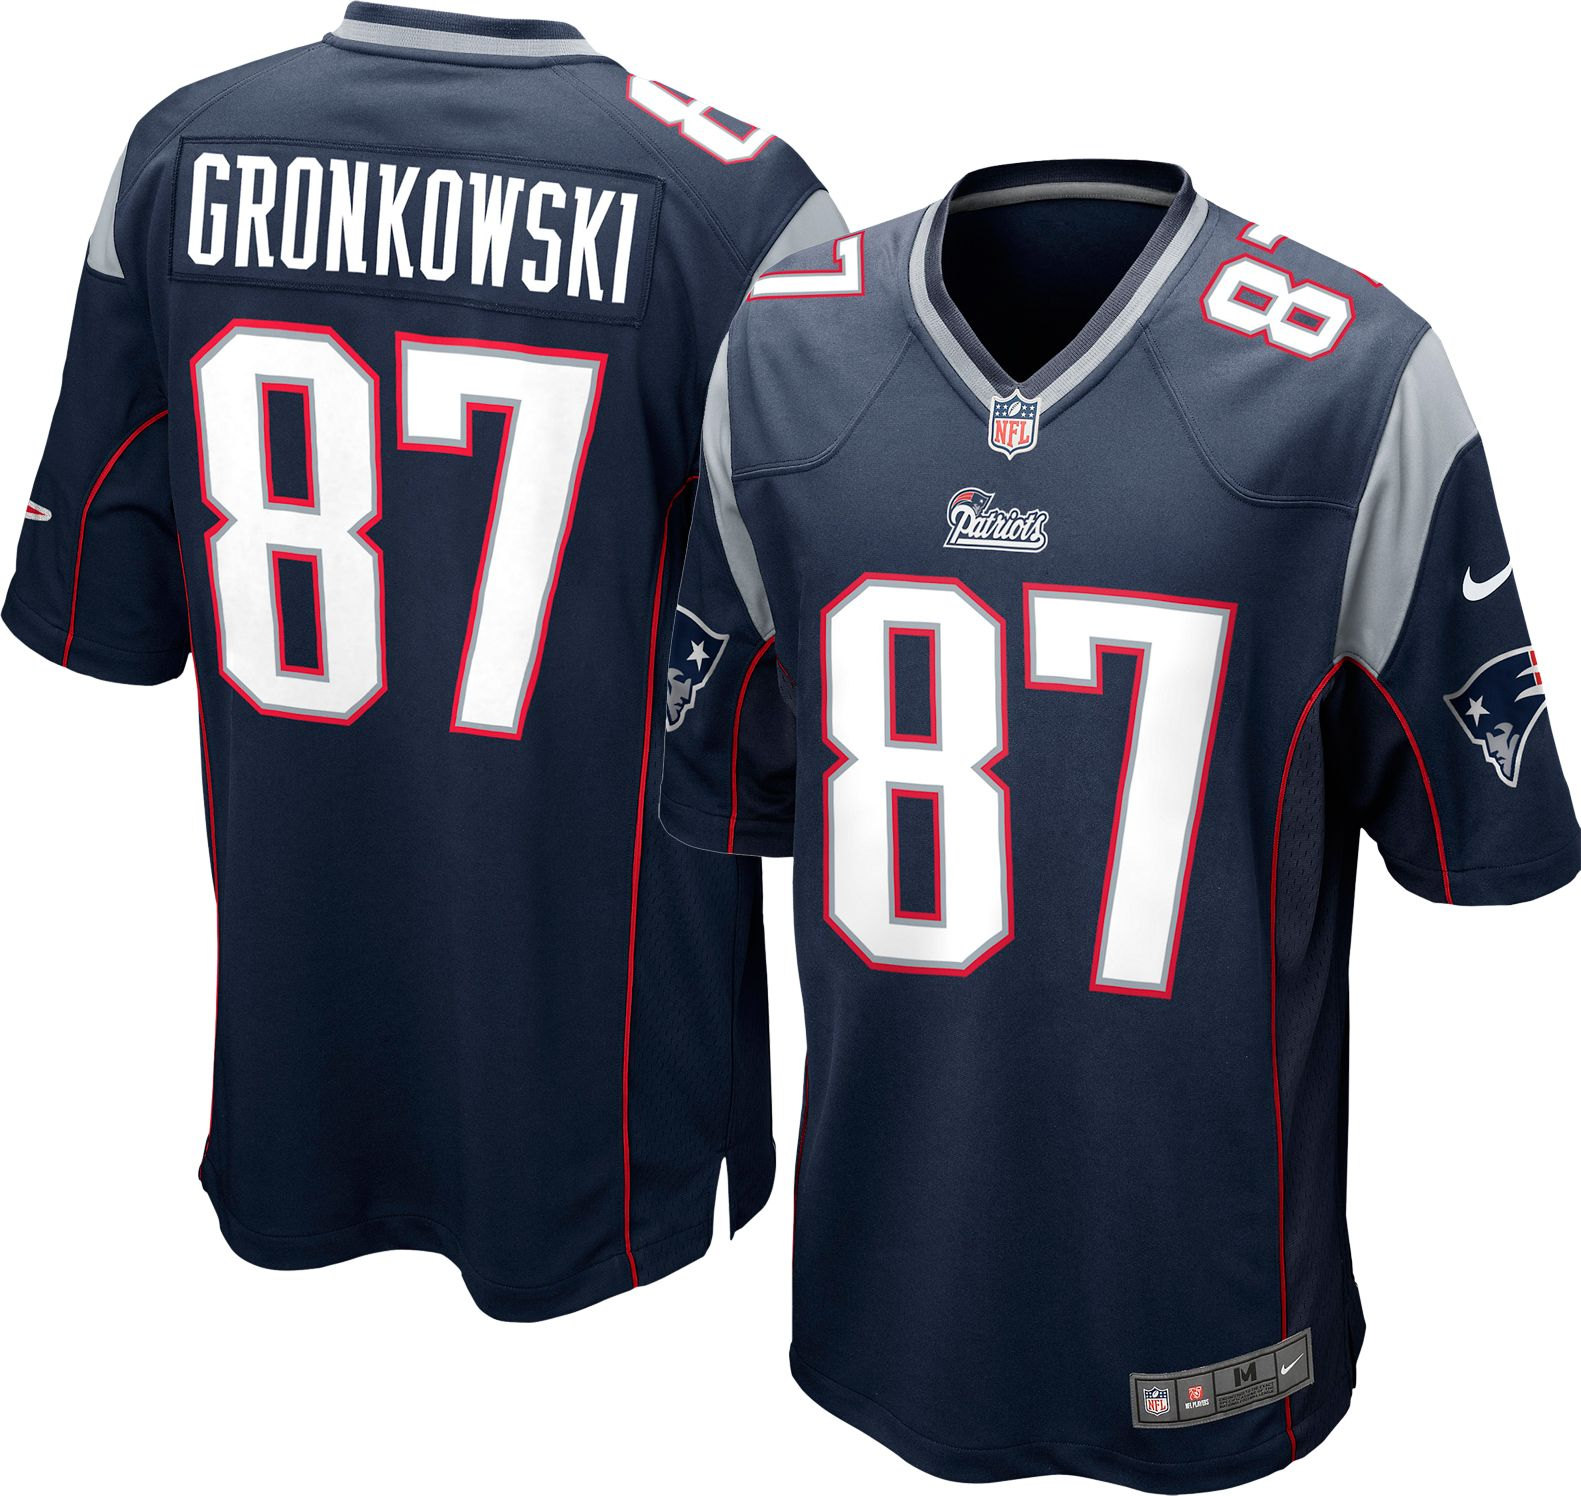 buy popular 23b0b 90164 rob gronkowski nfl jersey